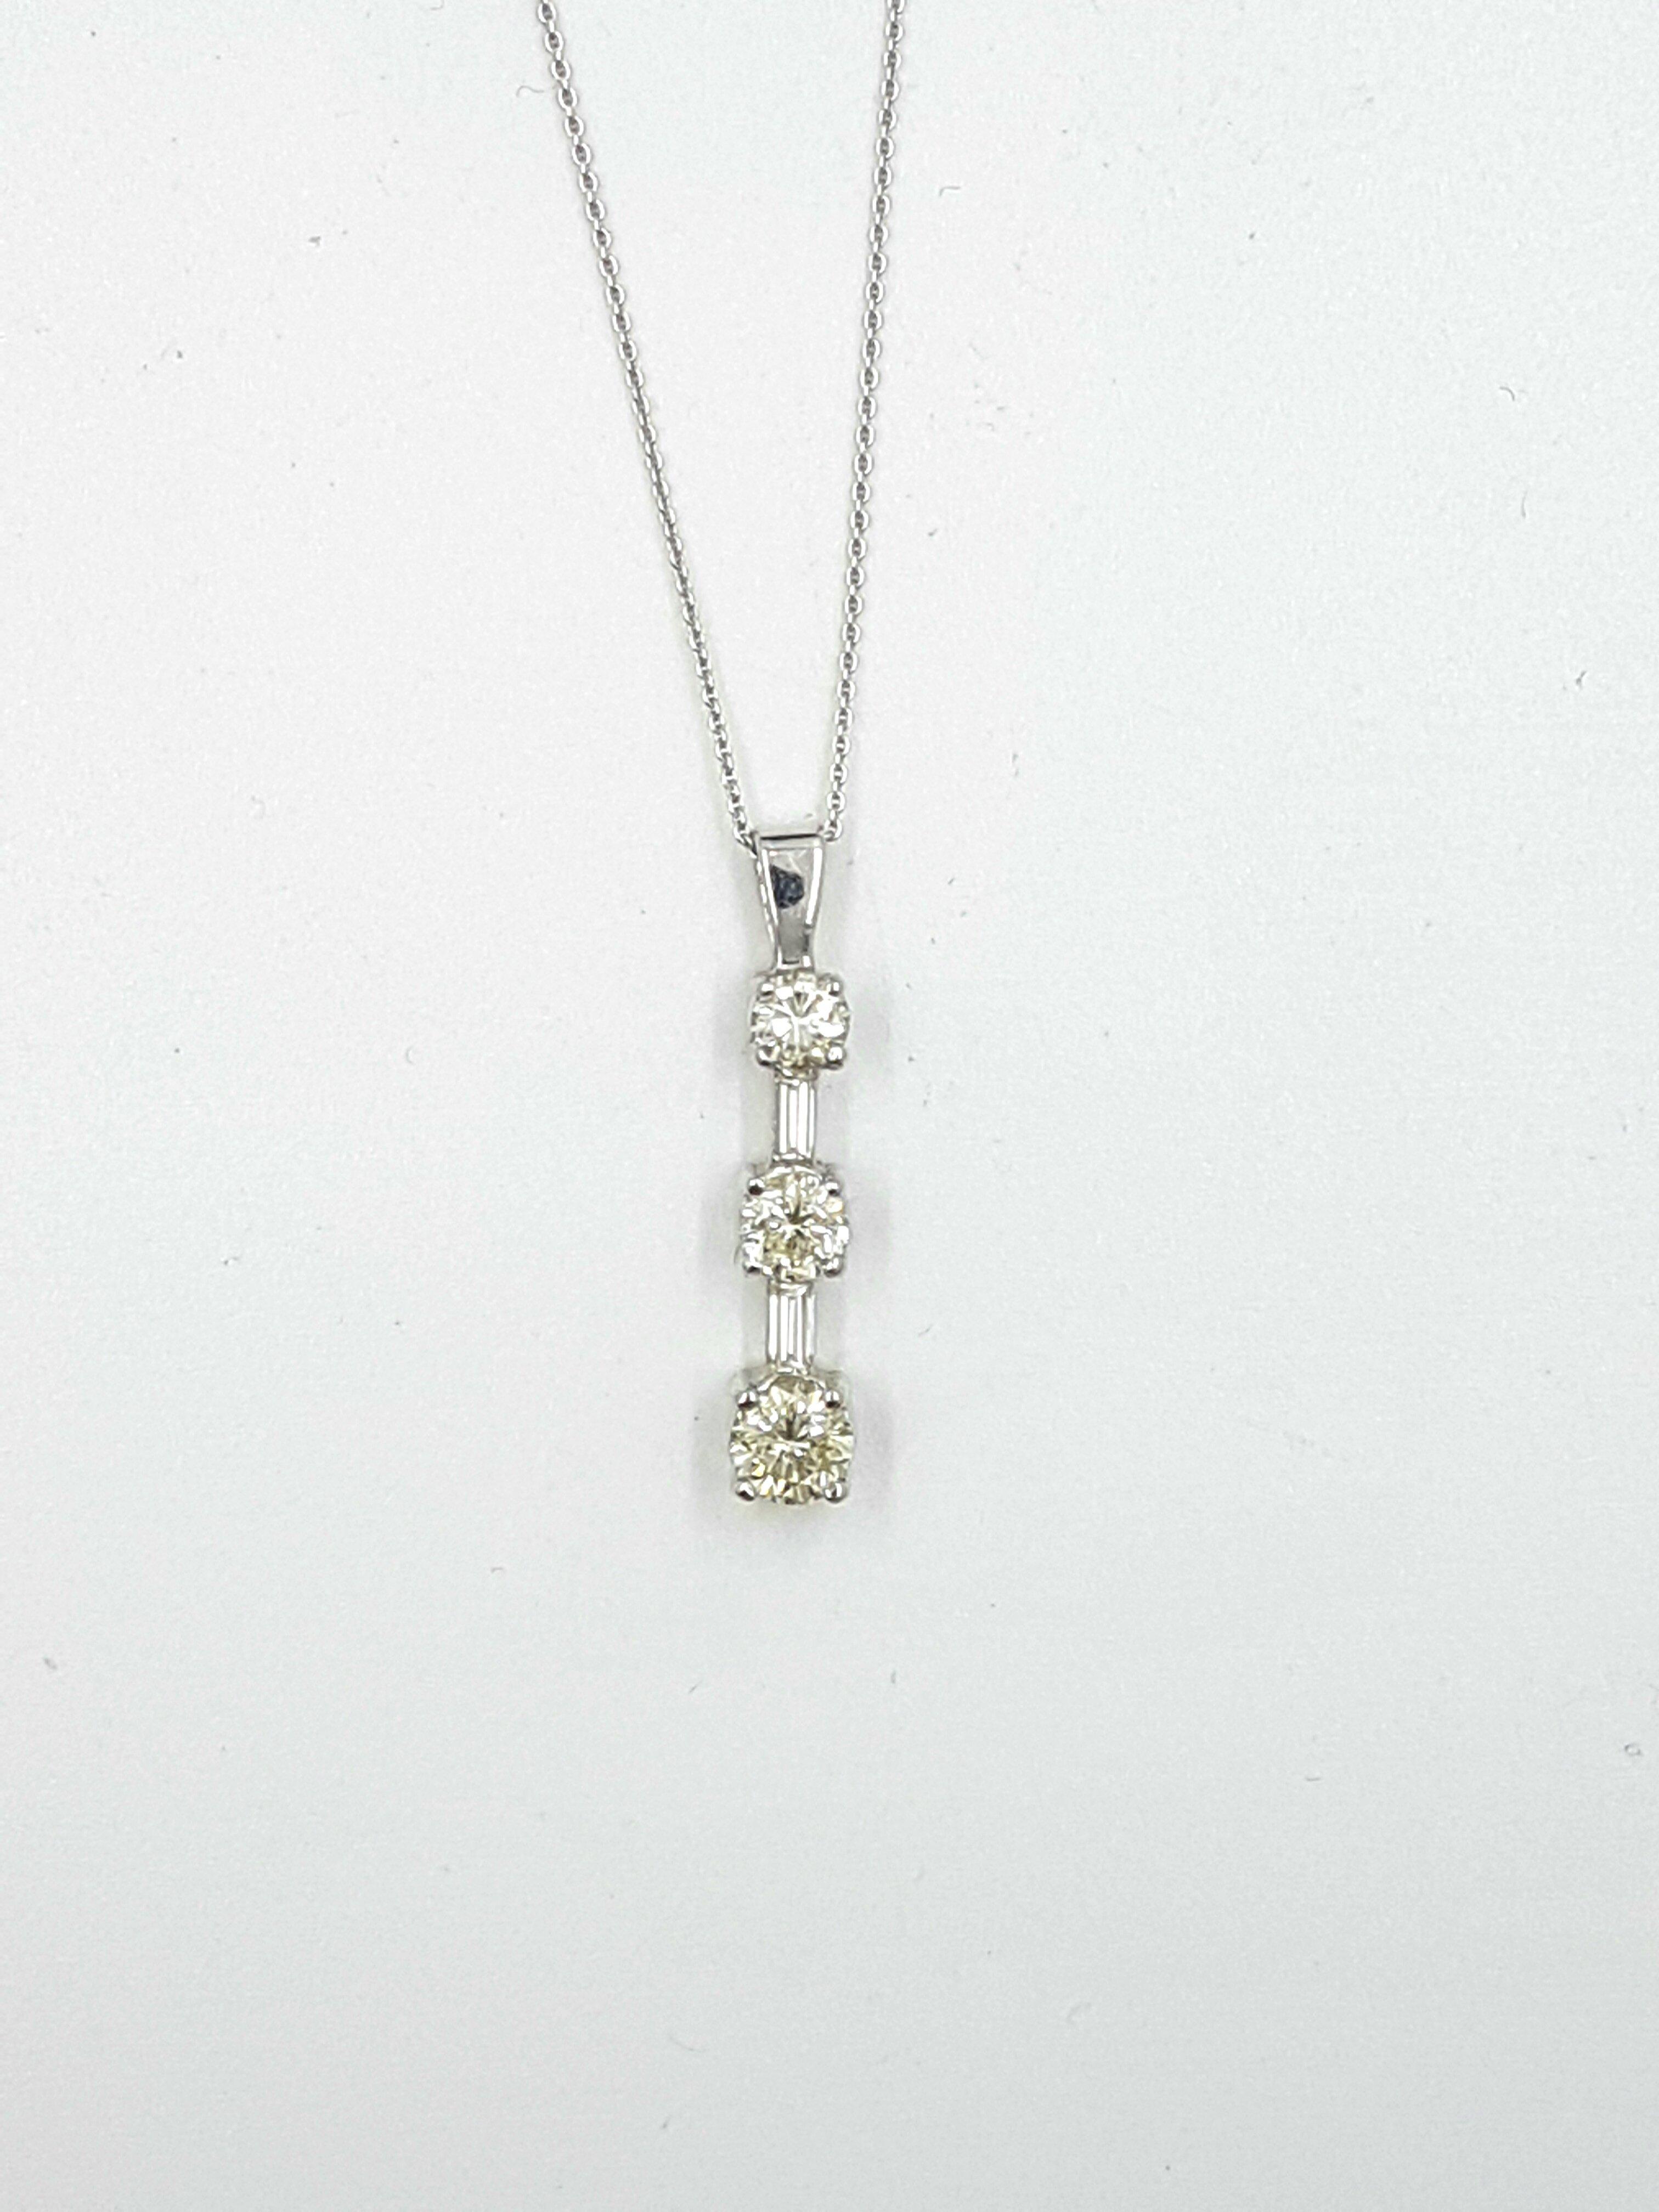 14K white gold 1.00ct Regular Price $6425 SALE $1495 Ref: #HN606